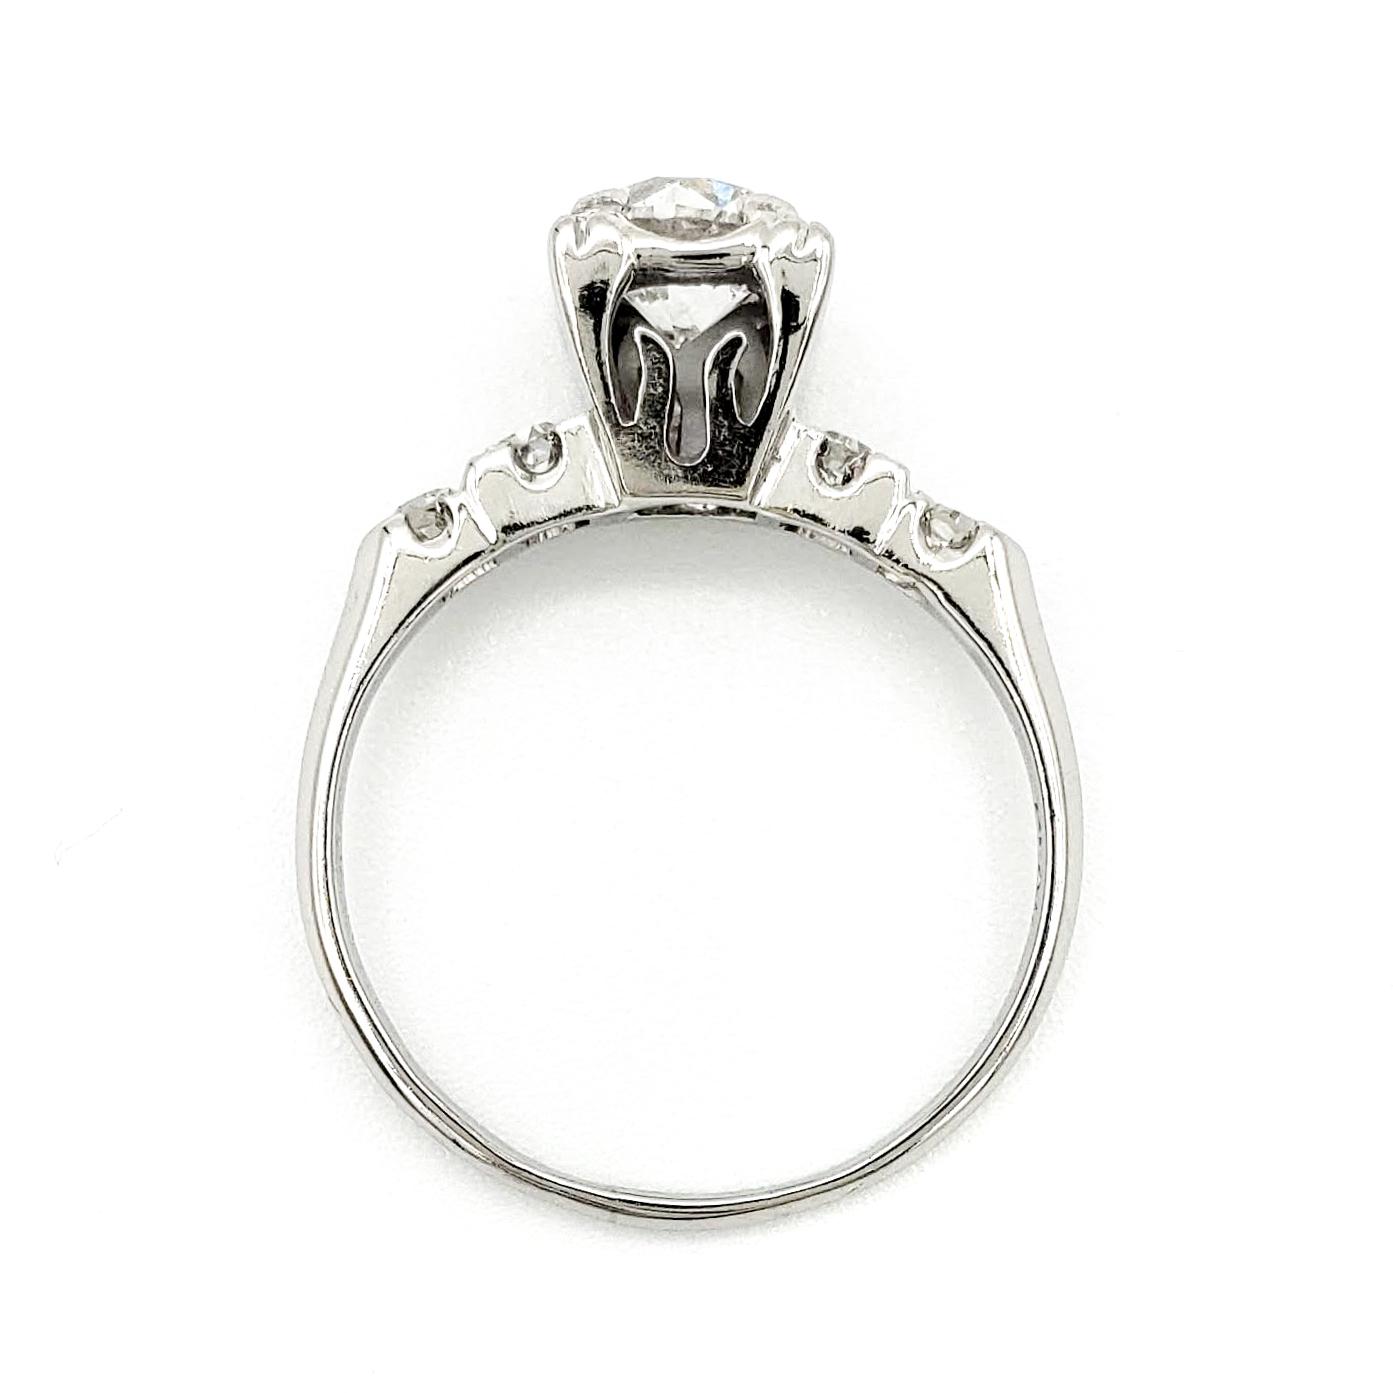 vintage-platinum-engagement-ring-with-0-74-carat-round-brilliant-cut-diamond-egl-g-si3